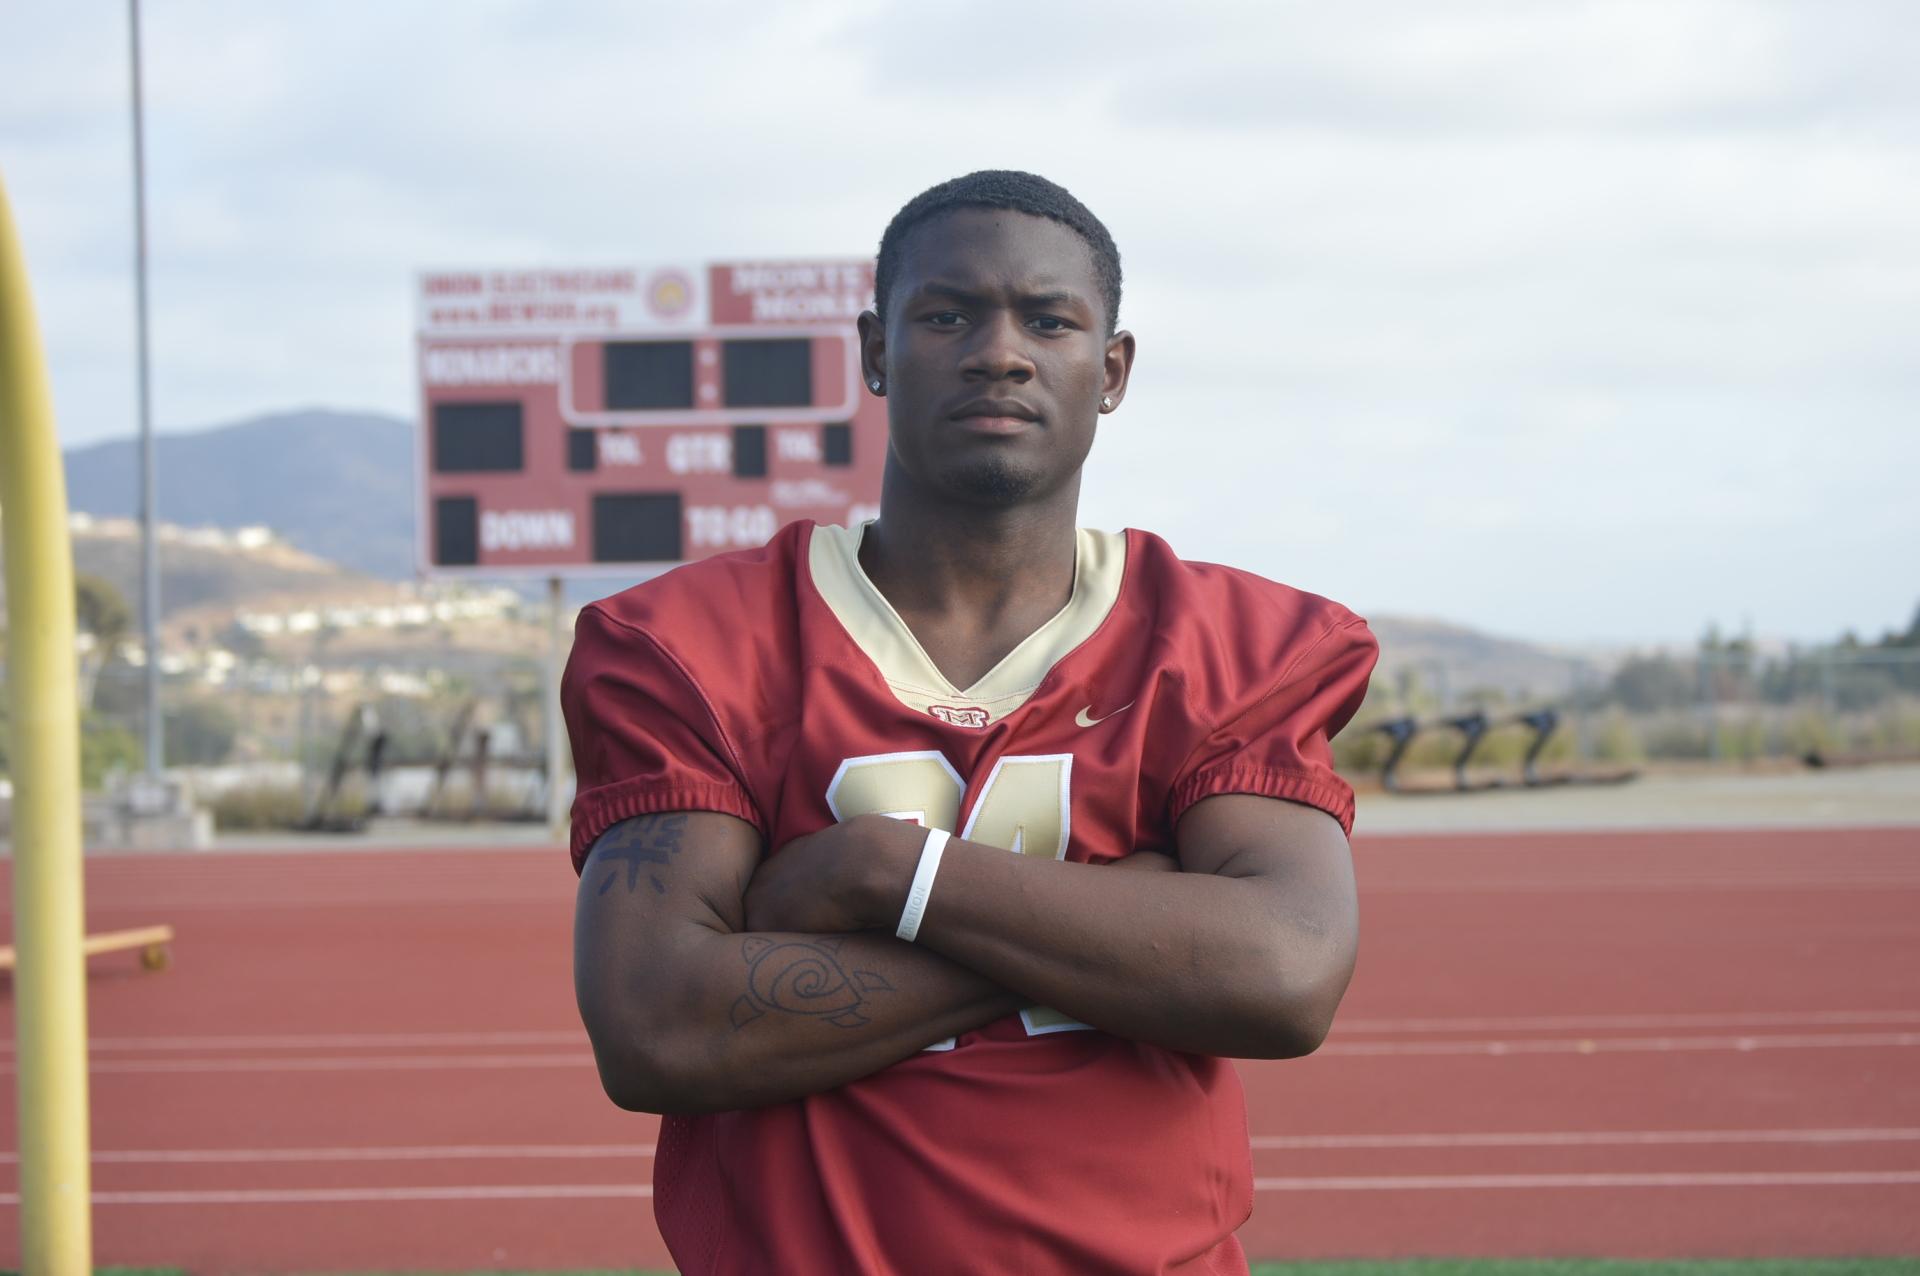 Monte Vista High School - RB Jahmon McClendon